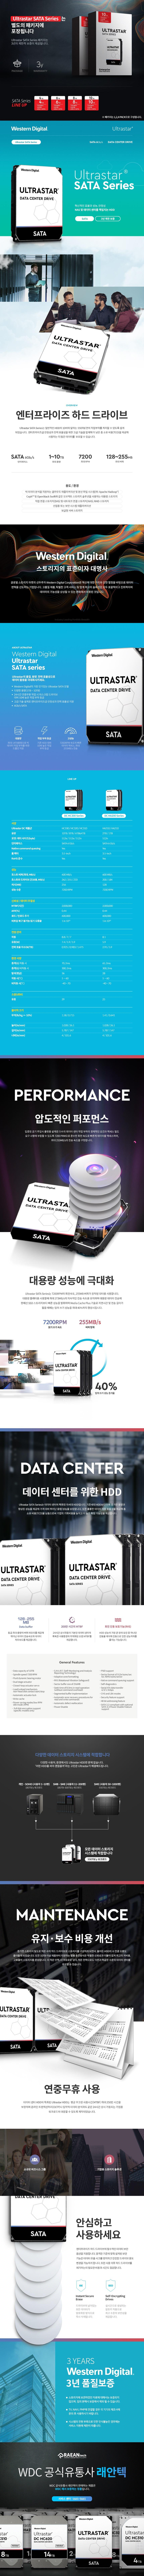 Western Digital  10TB Ultrastar DC HC330 WUS721010ALE6L4 패키지 (SATA3/7200/256M/2PACK)